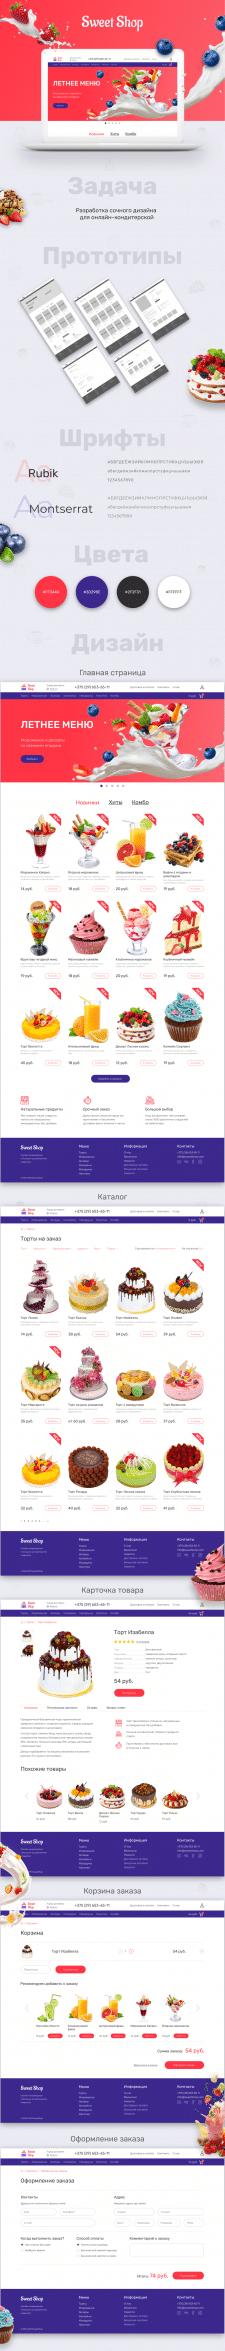 Дизайн онлайн-кондитерской